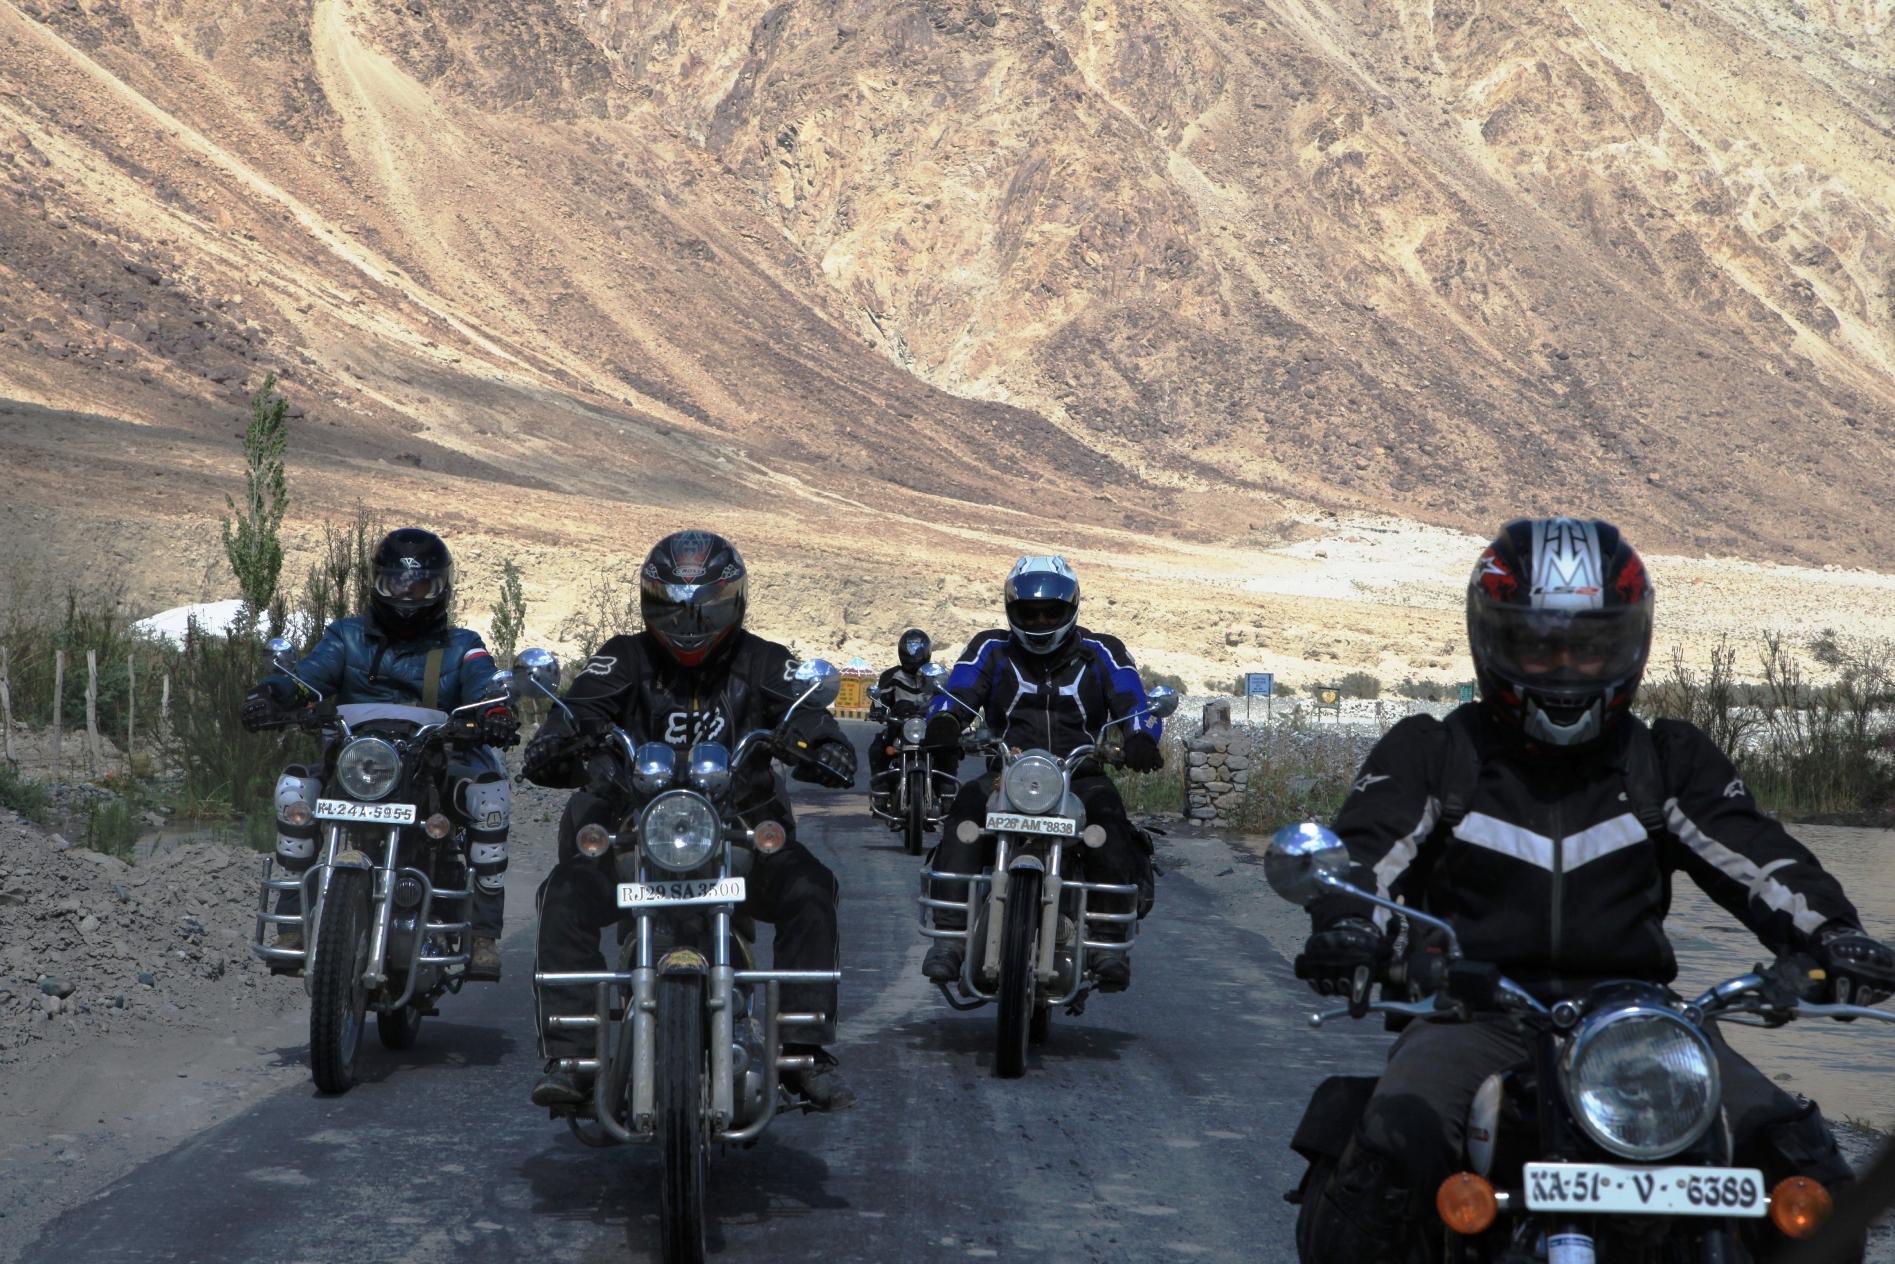 Royal-Enfield-Himalayan-Odyssey-20121